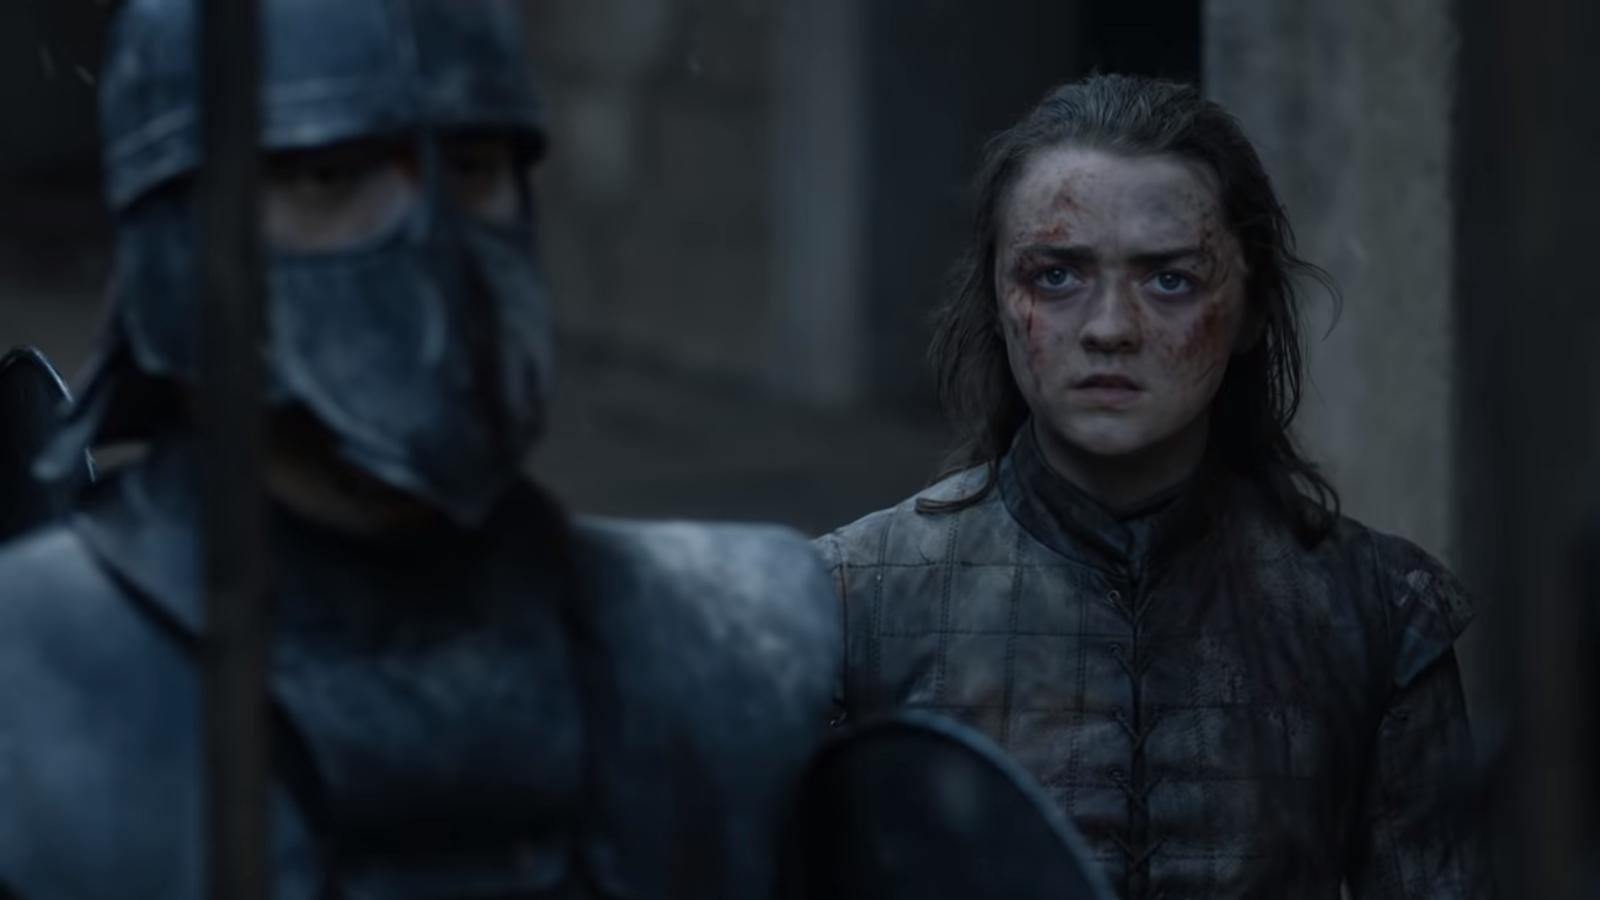 Game of Thrones Il Trono di Spade The Iron Throne